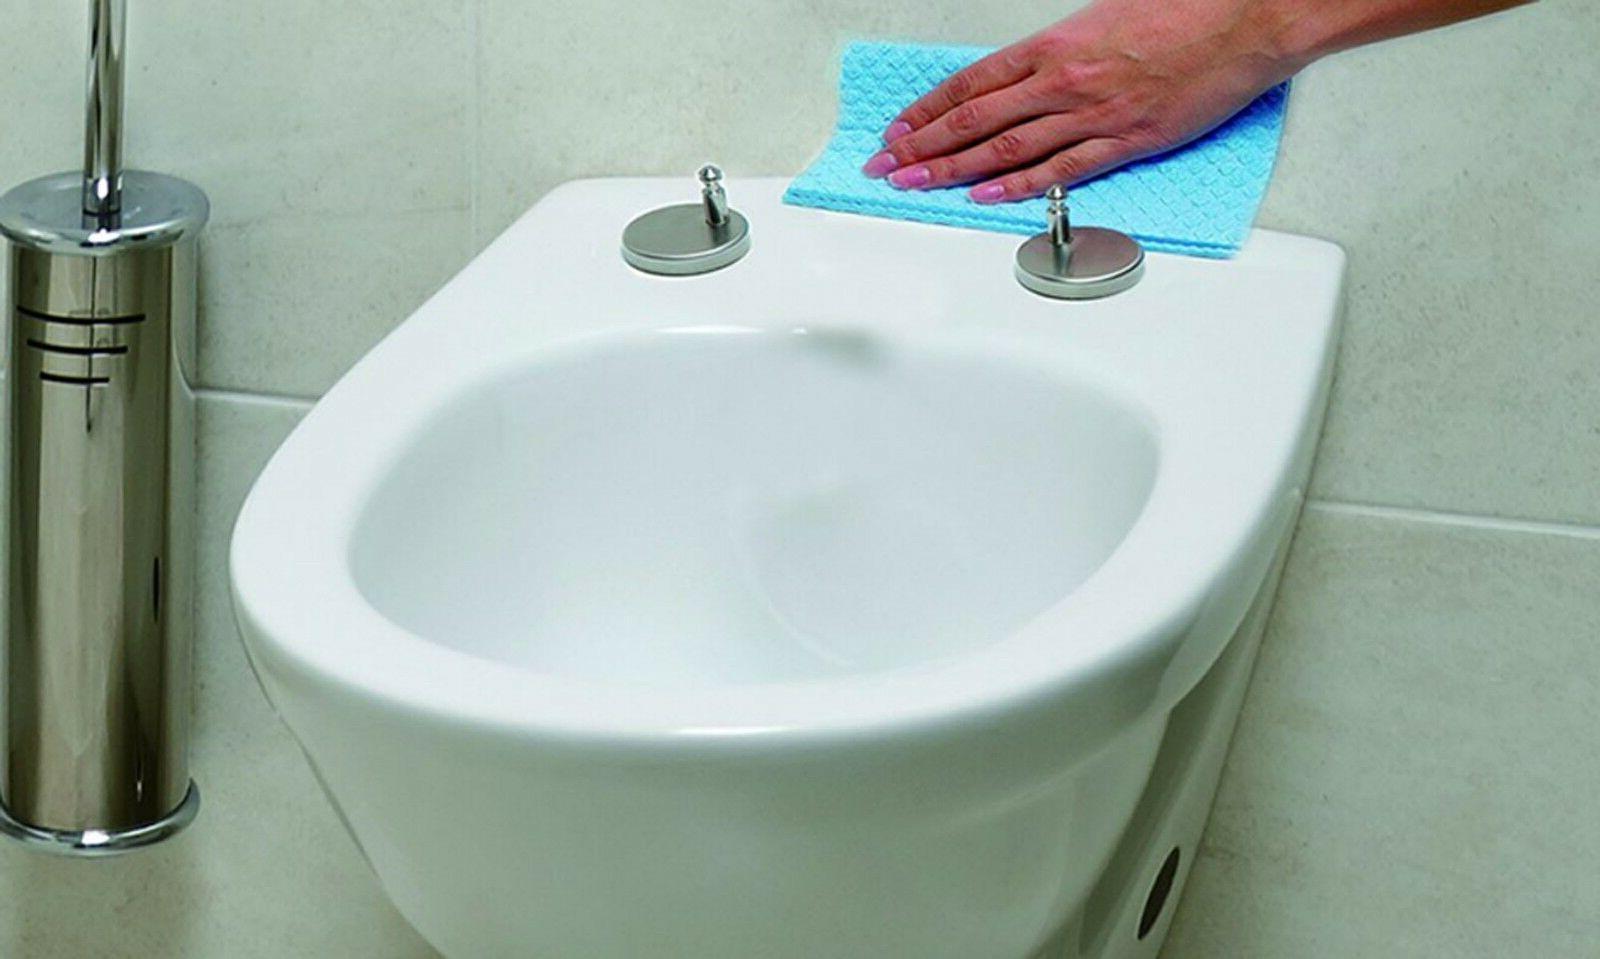 LUXURY SLOW WHITE BATHROOM SEAT WITH HINGES